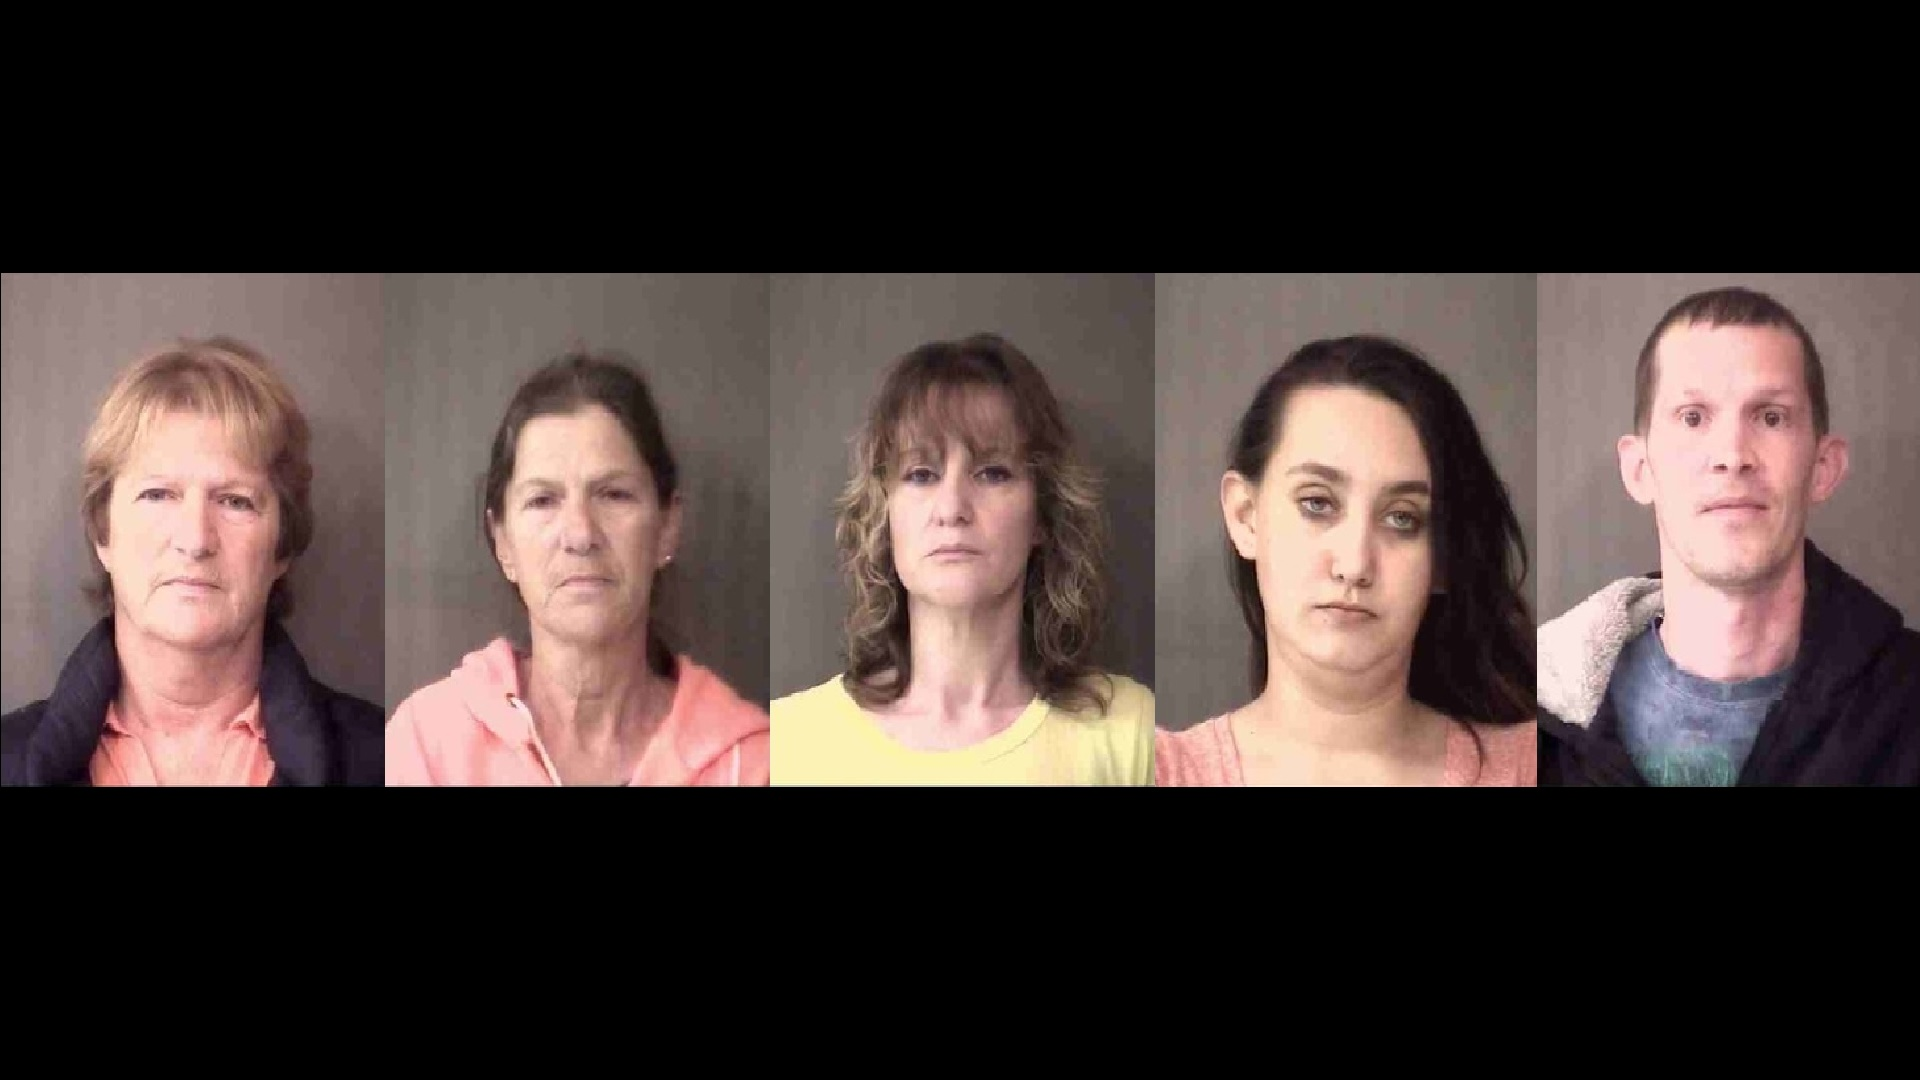 5 Suspects 4_1539616507604.jpg.jpg